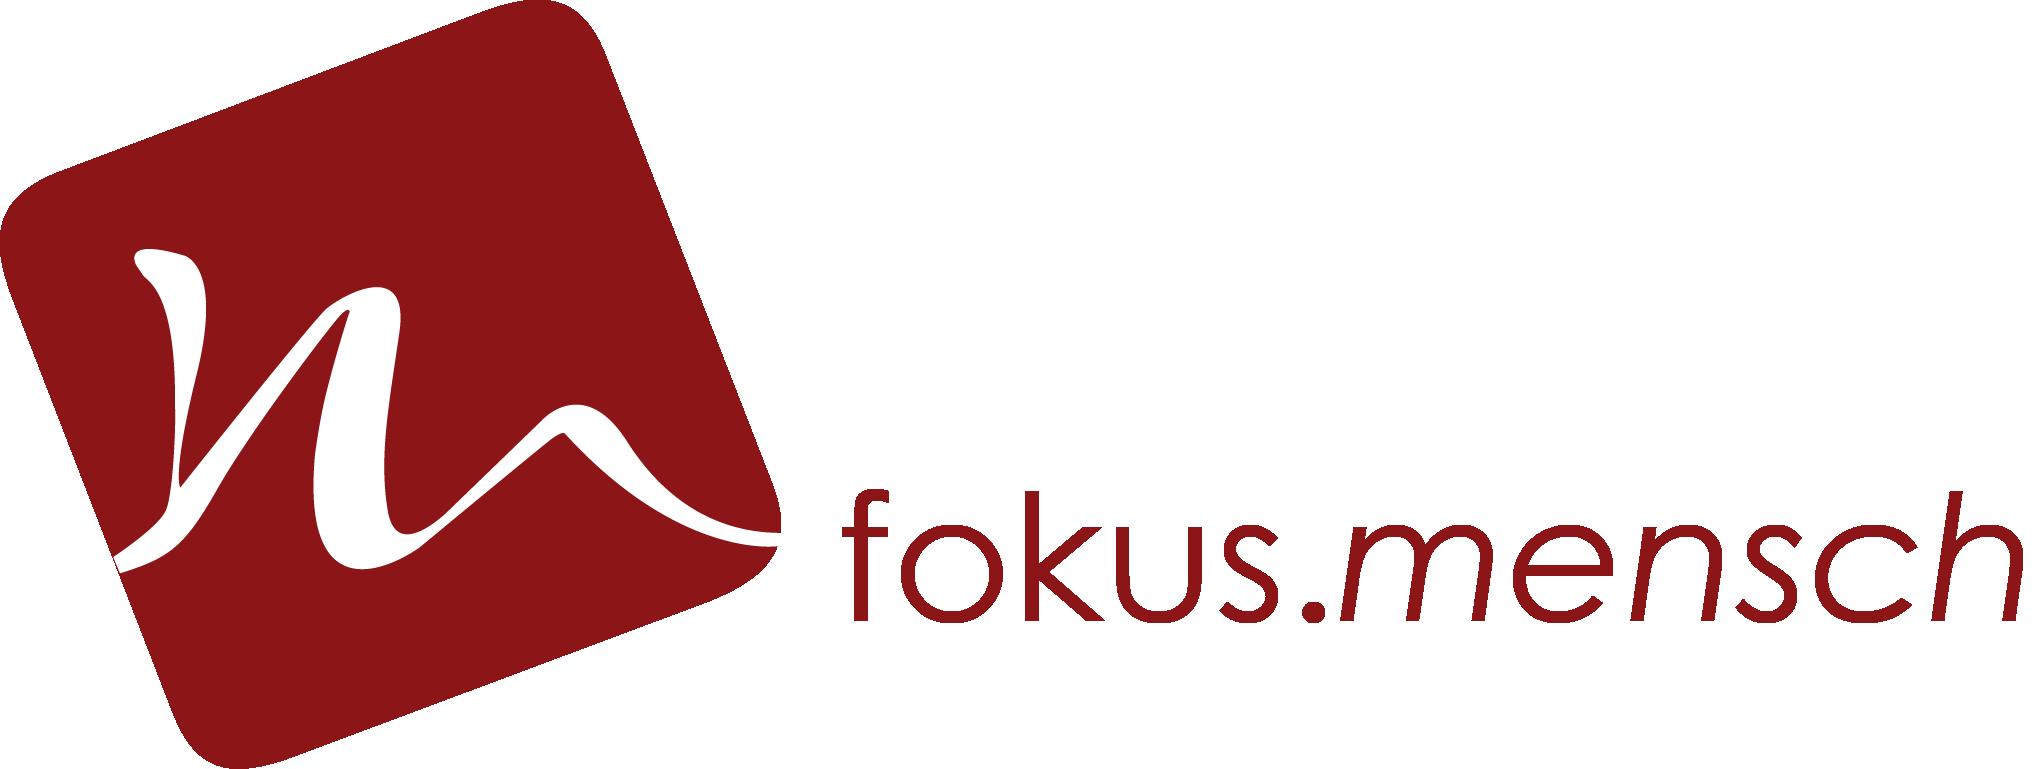 fokus-mensch-logo-512x384